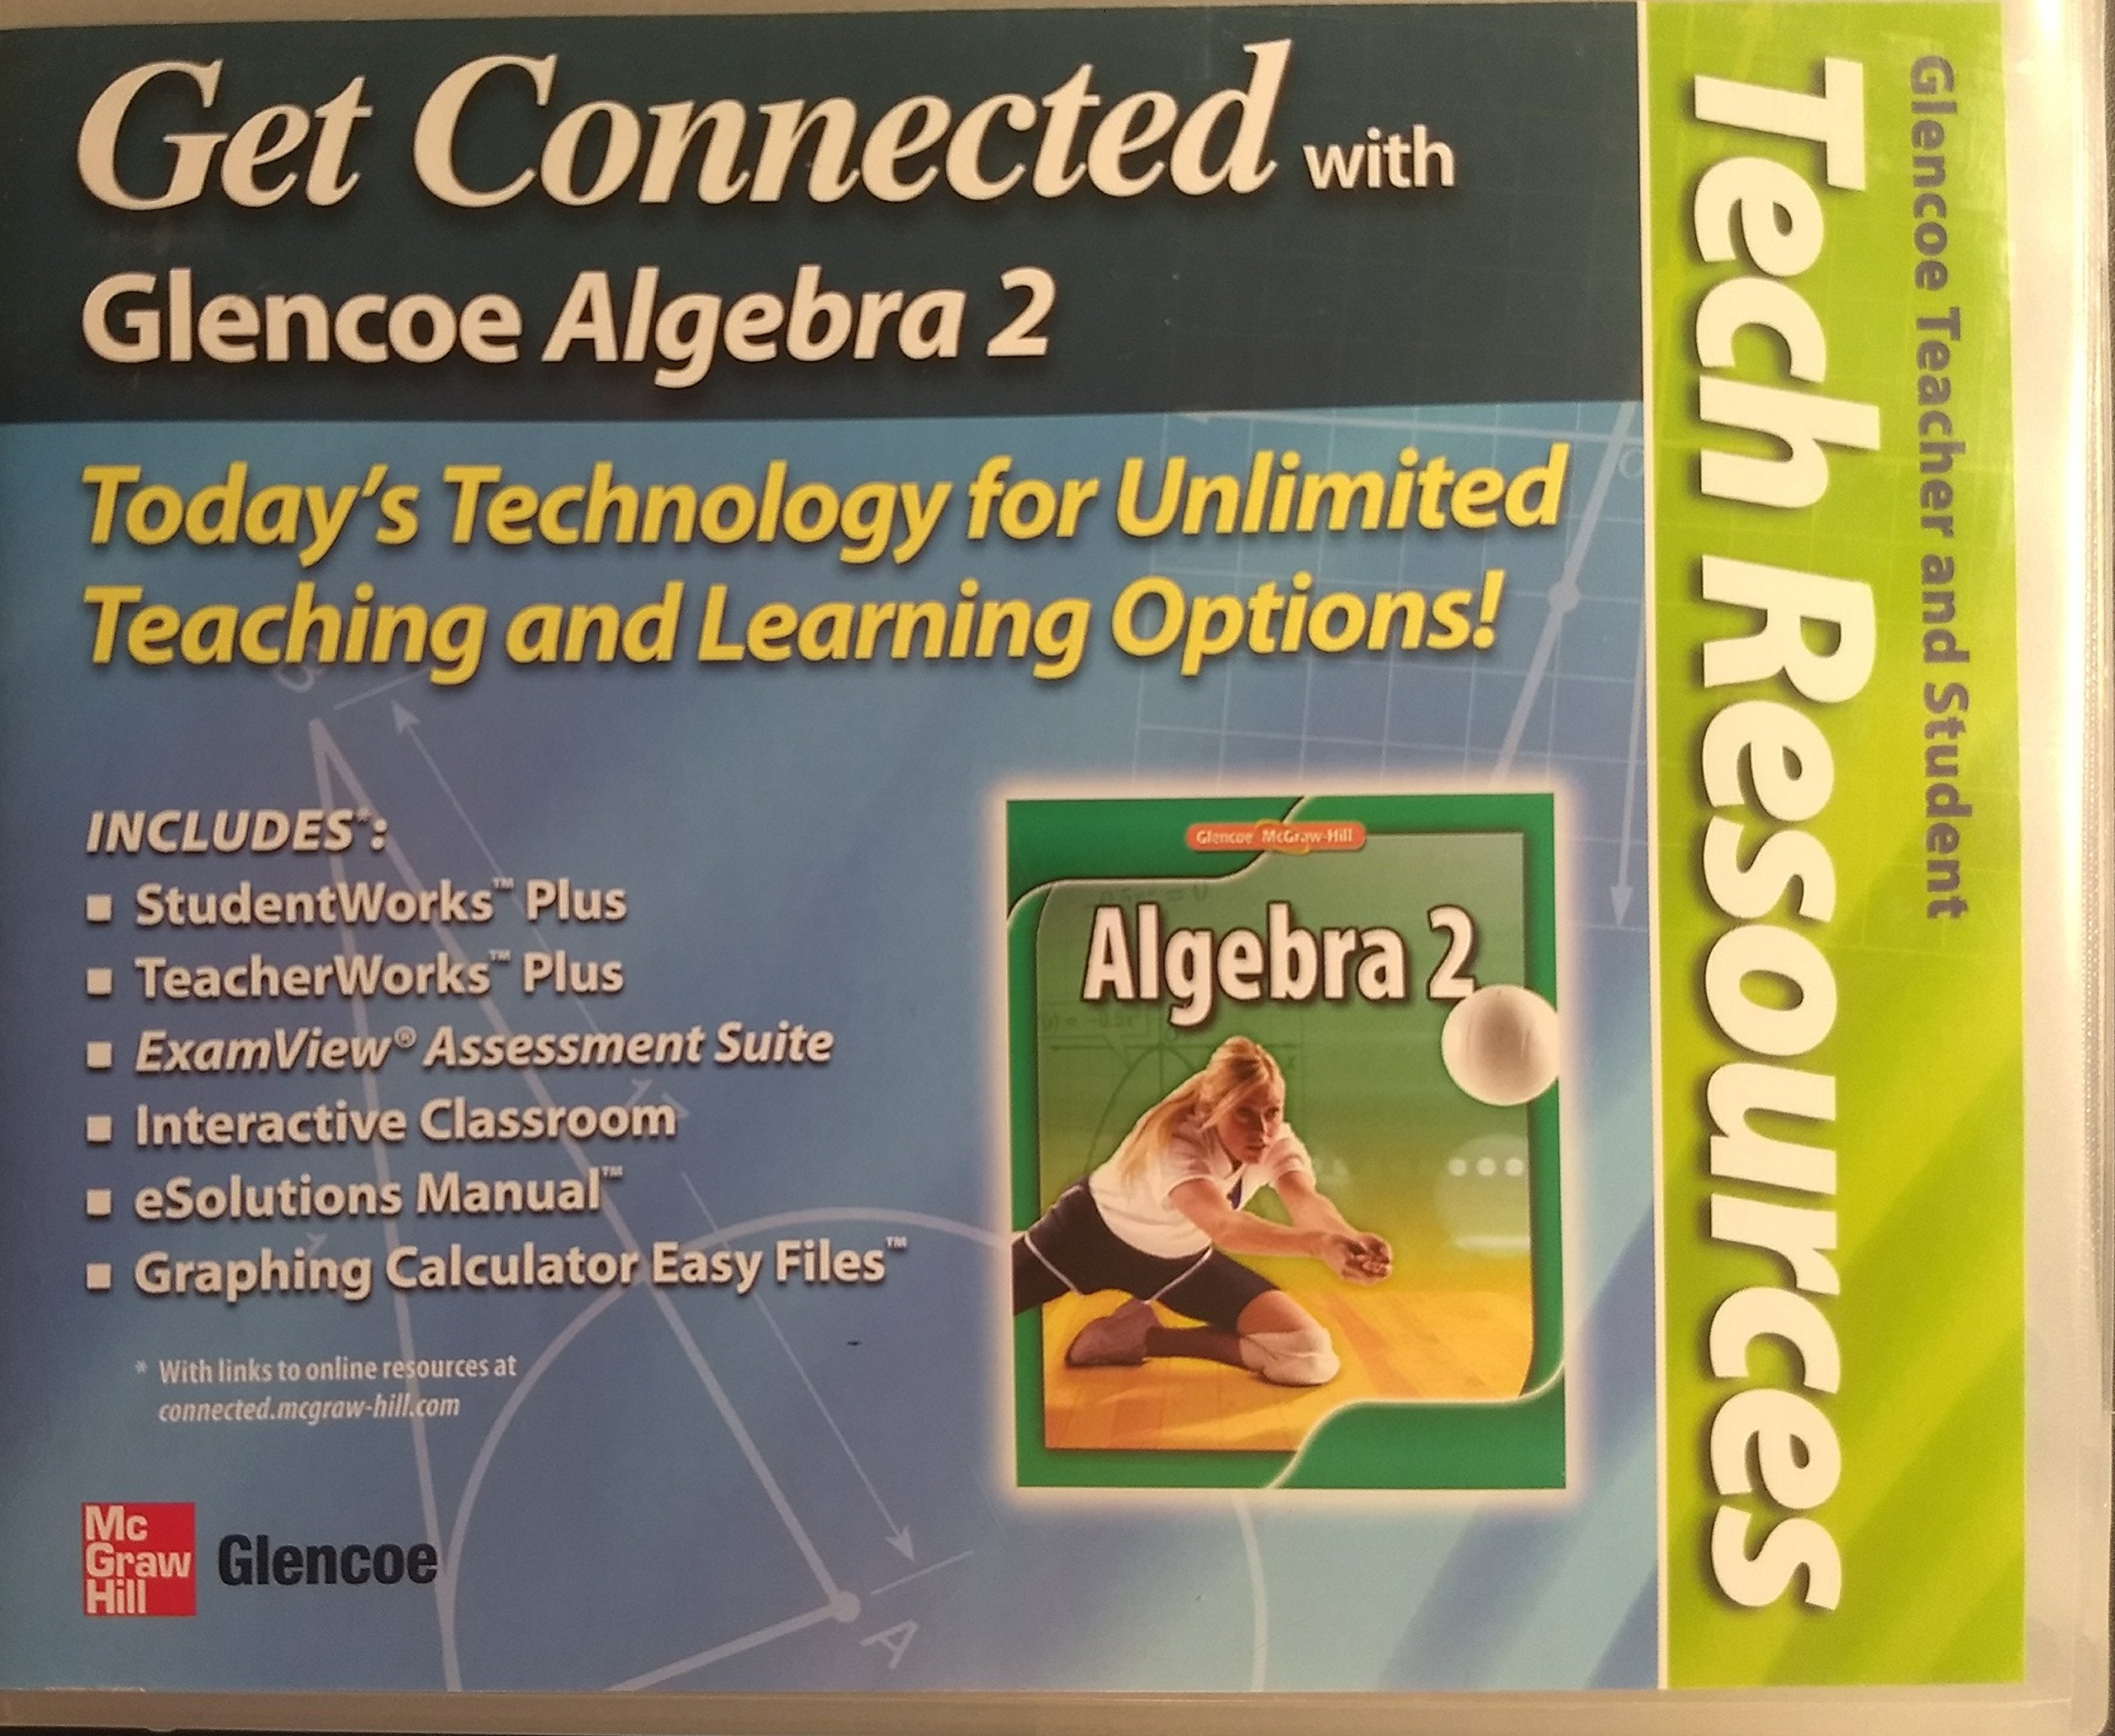 Glencoe Algebra 2 Teacher and Student Tech Resources: Various